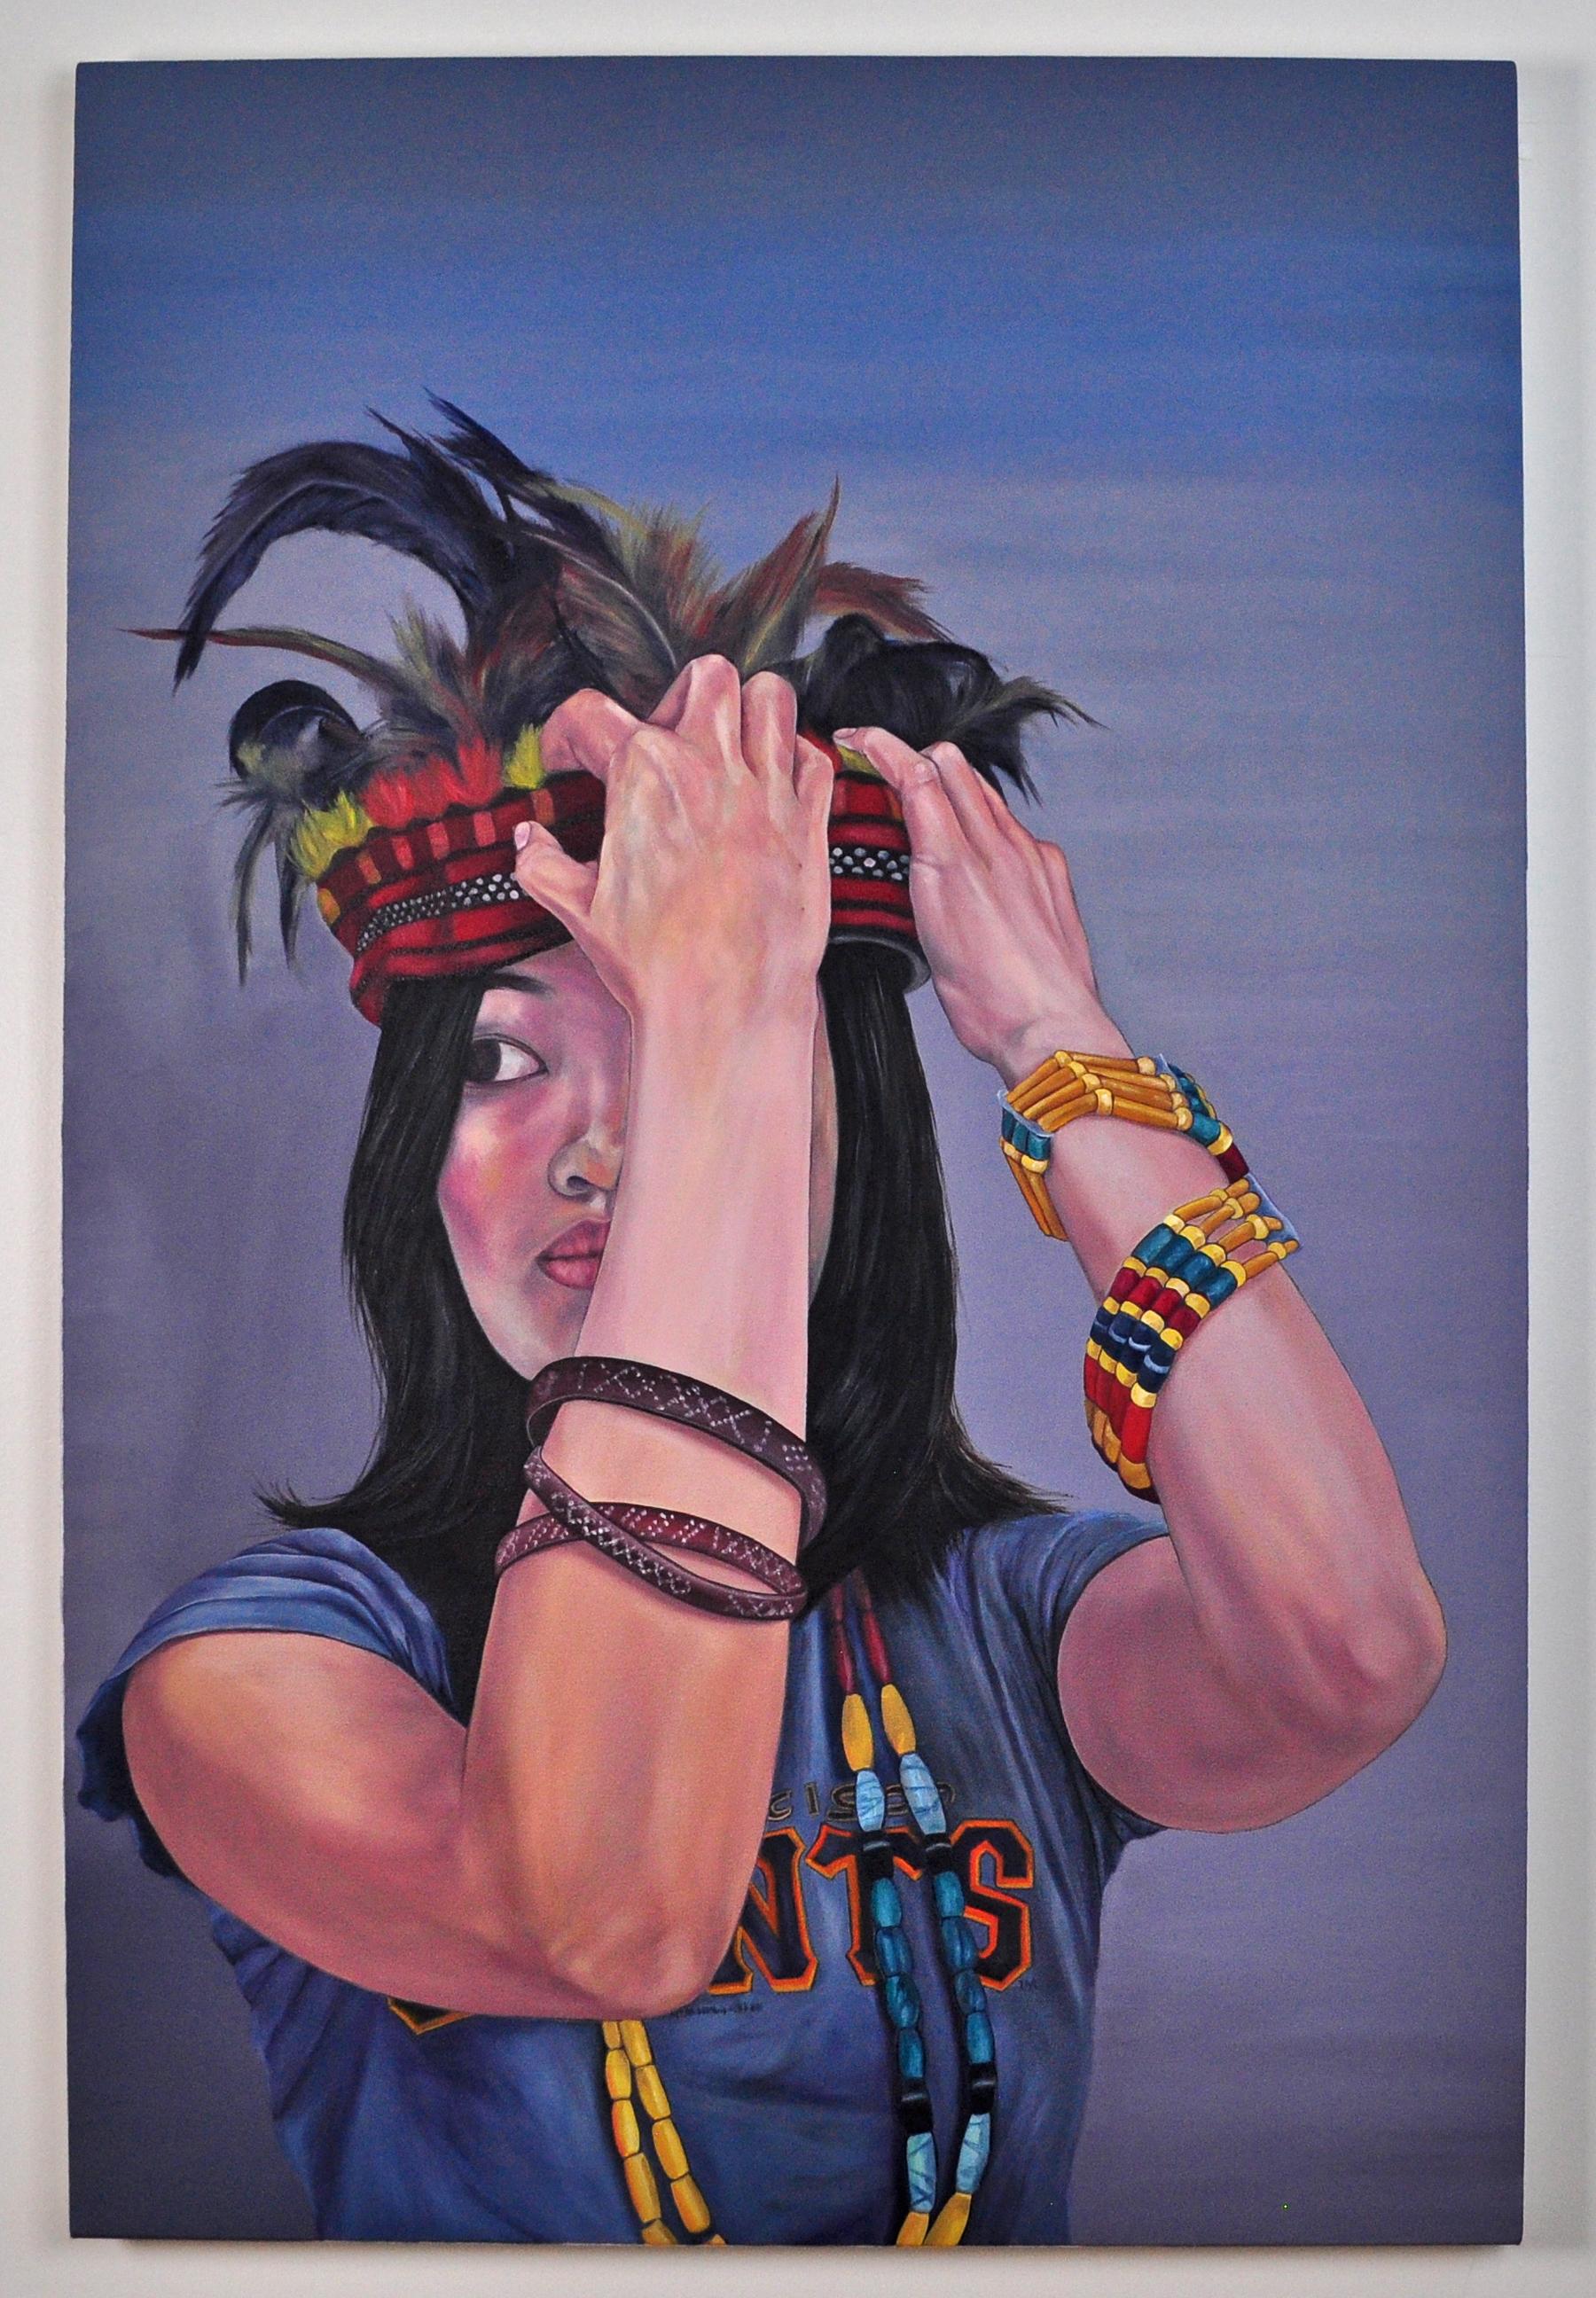 "Self Fitting , 2010.Oil on canvas over panel, 48"" x 32"" (Photo: Ramon Pintado)"